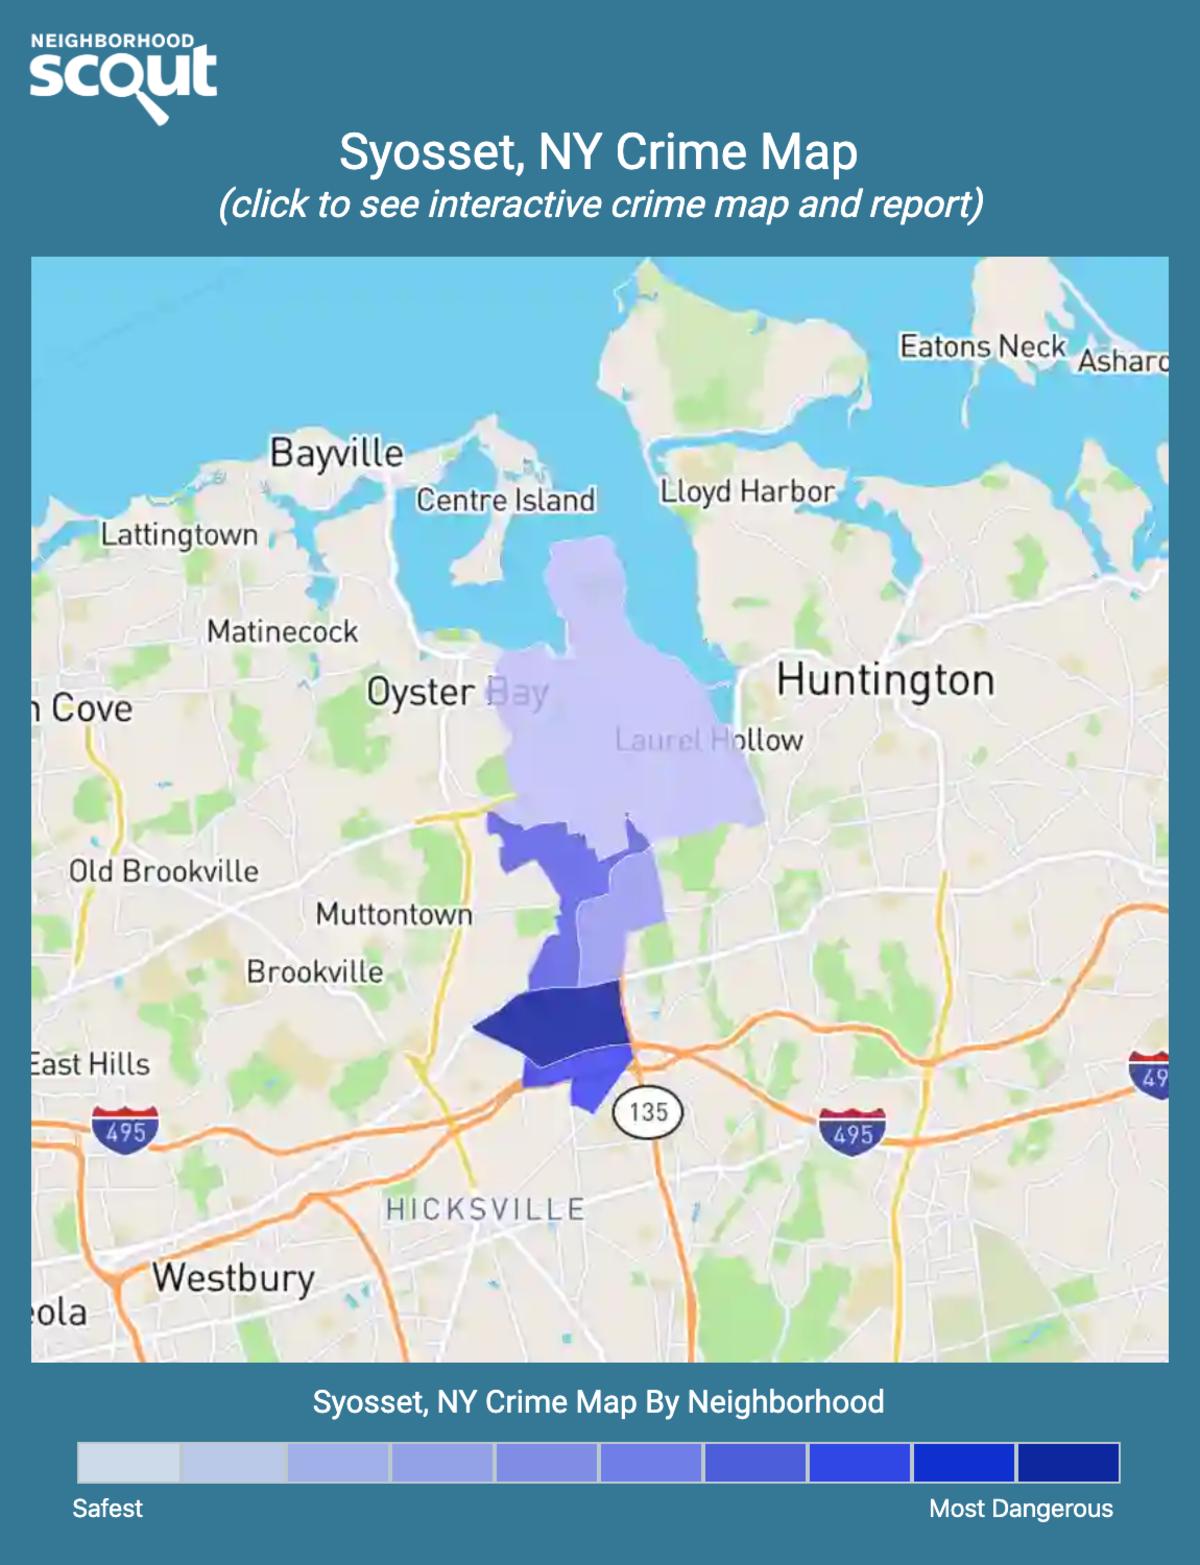 Syosset, New York crime map